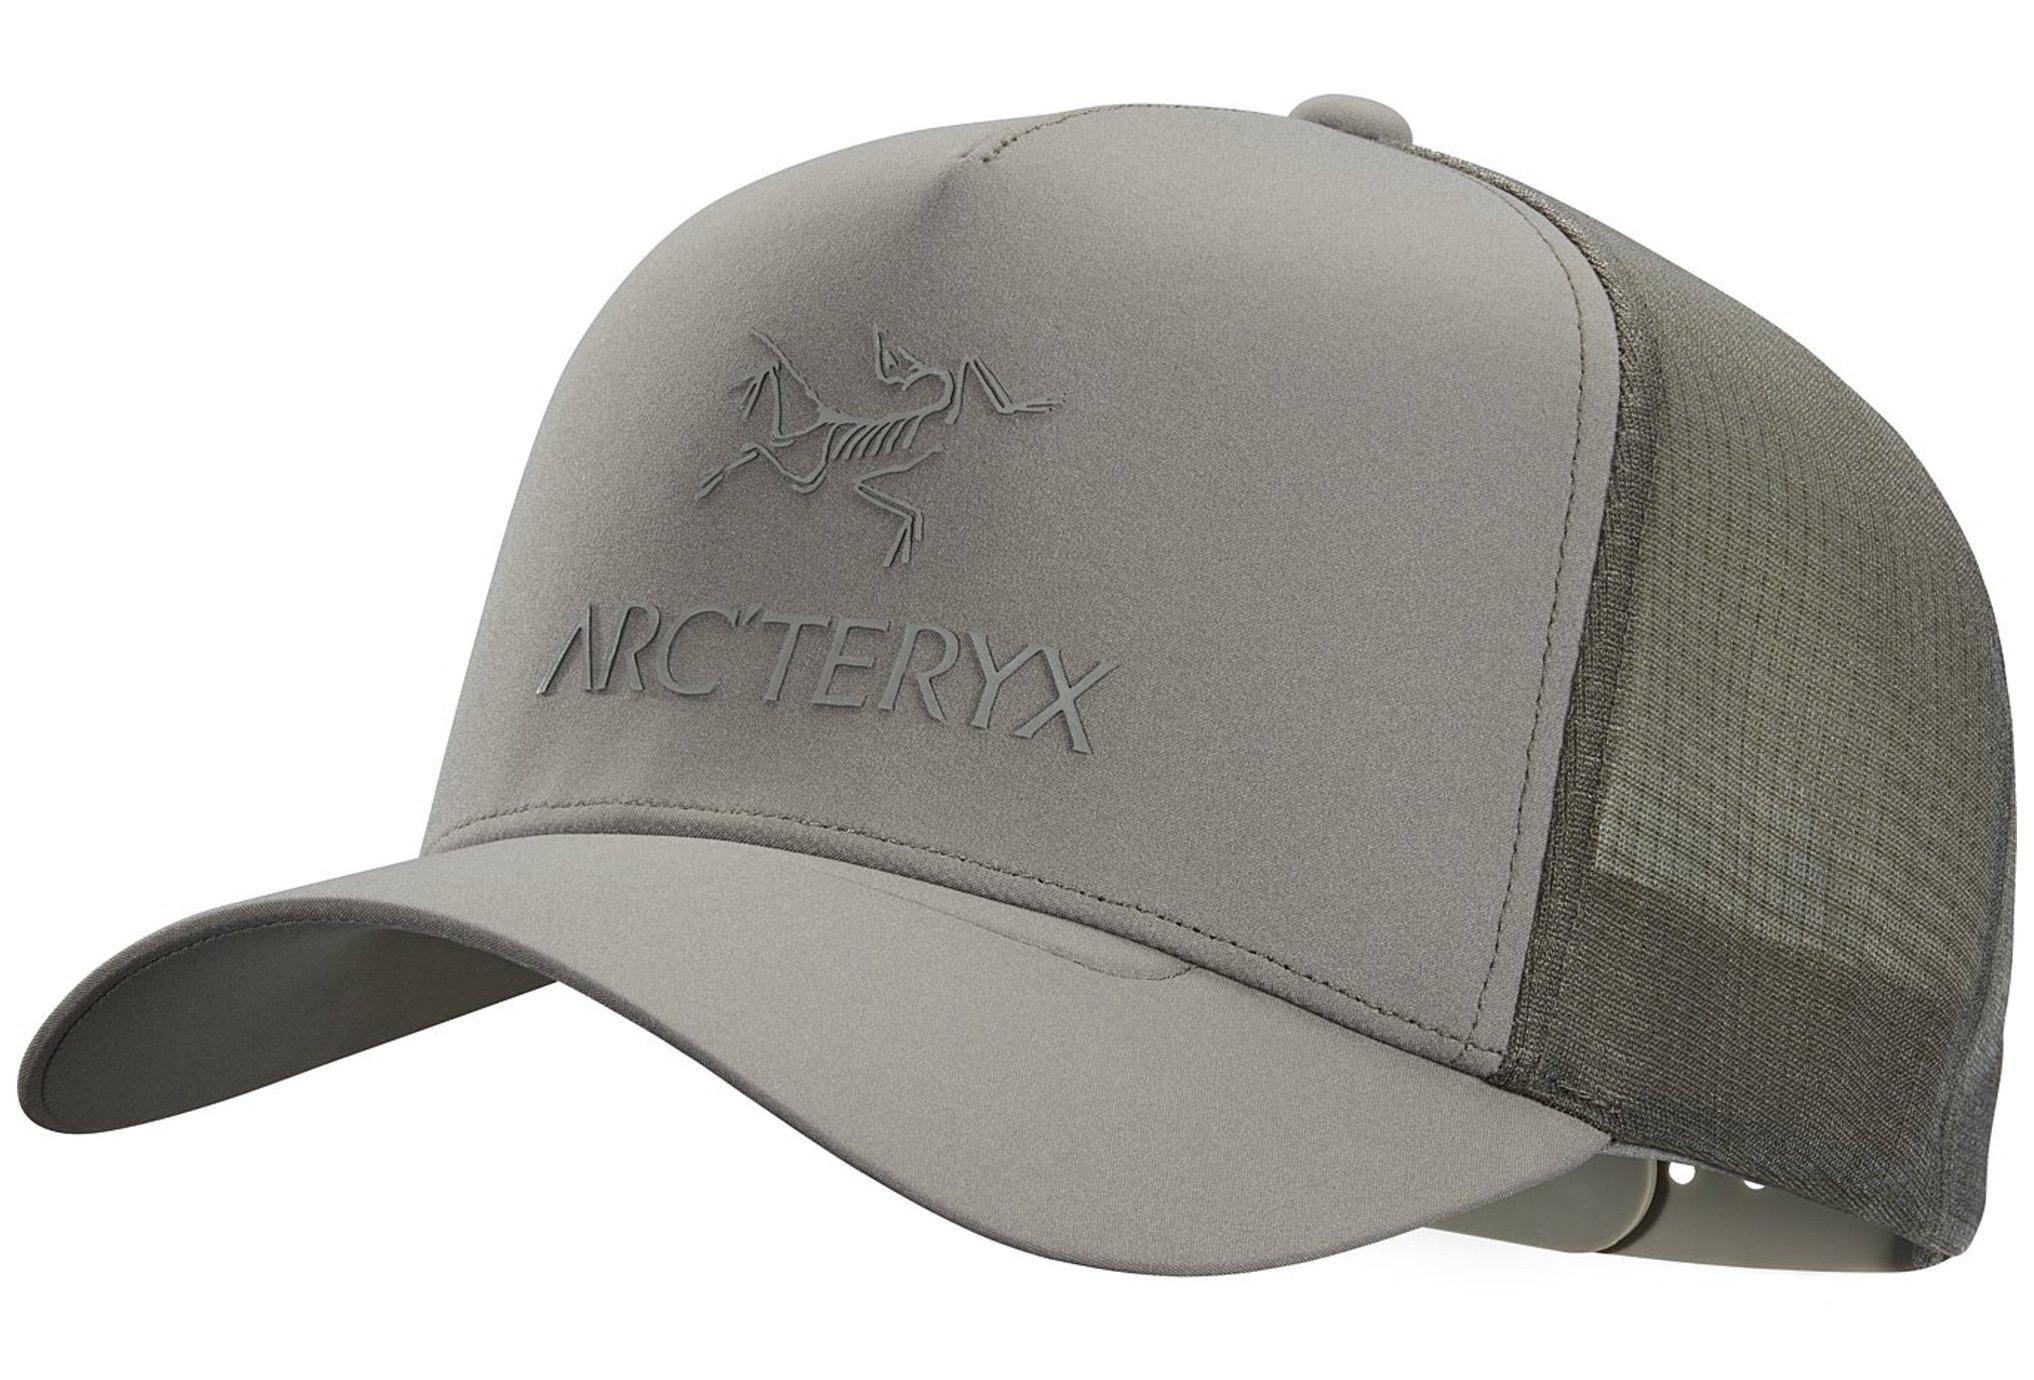 Arcteryx Trucker Logo Casquettes / bandeaux